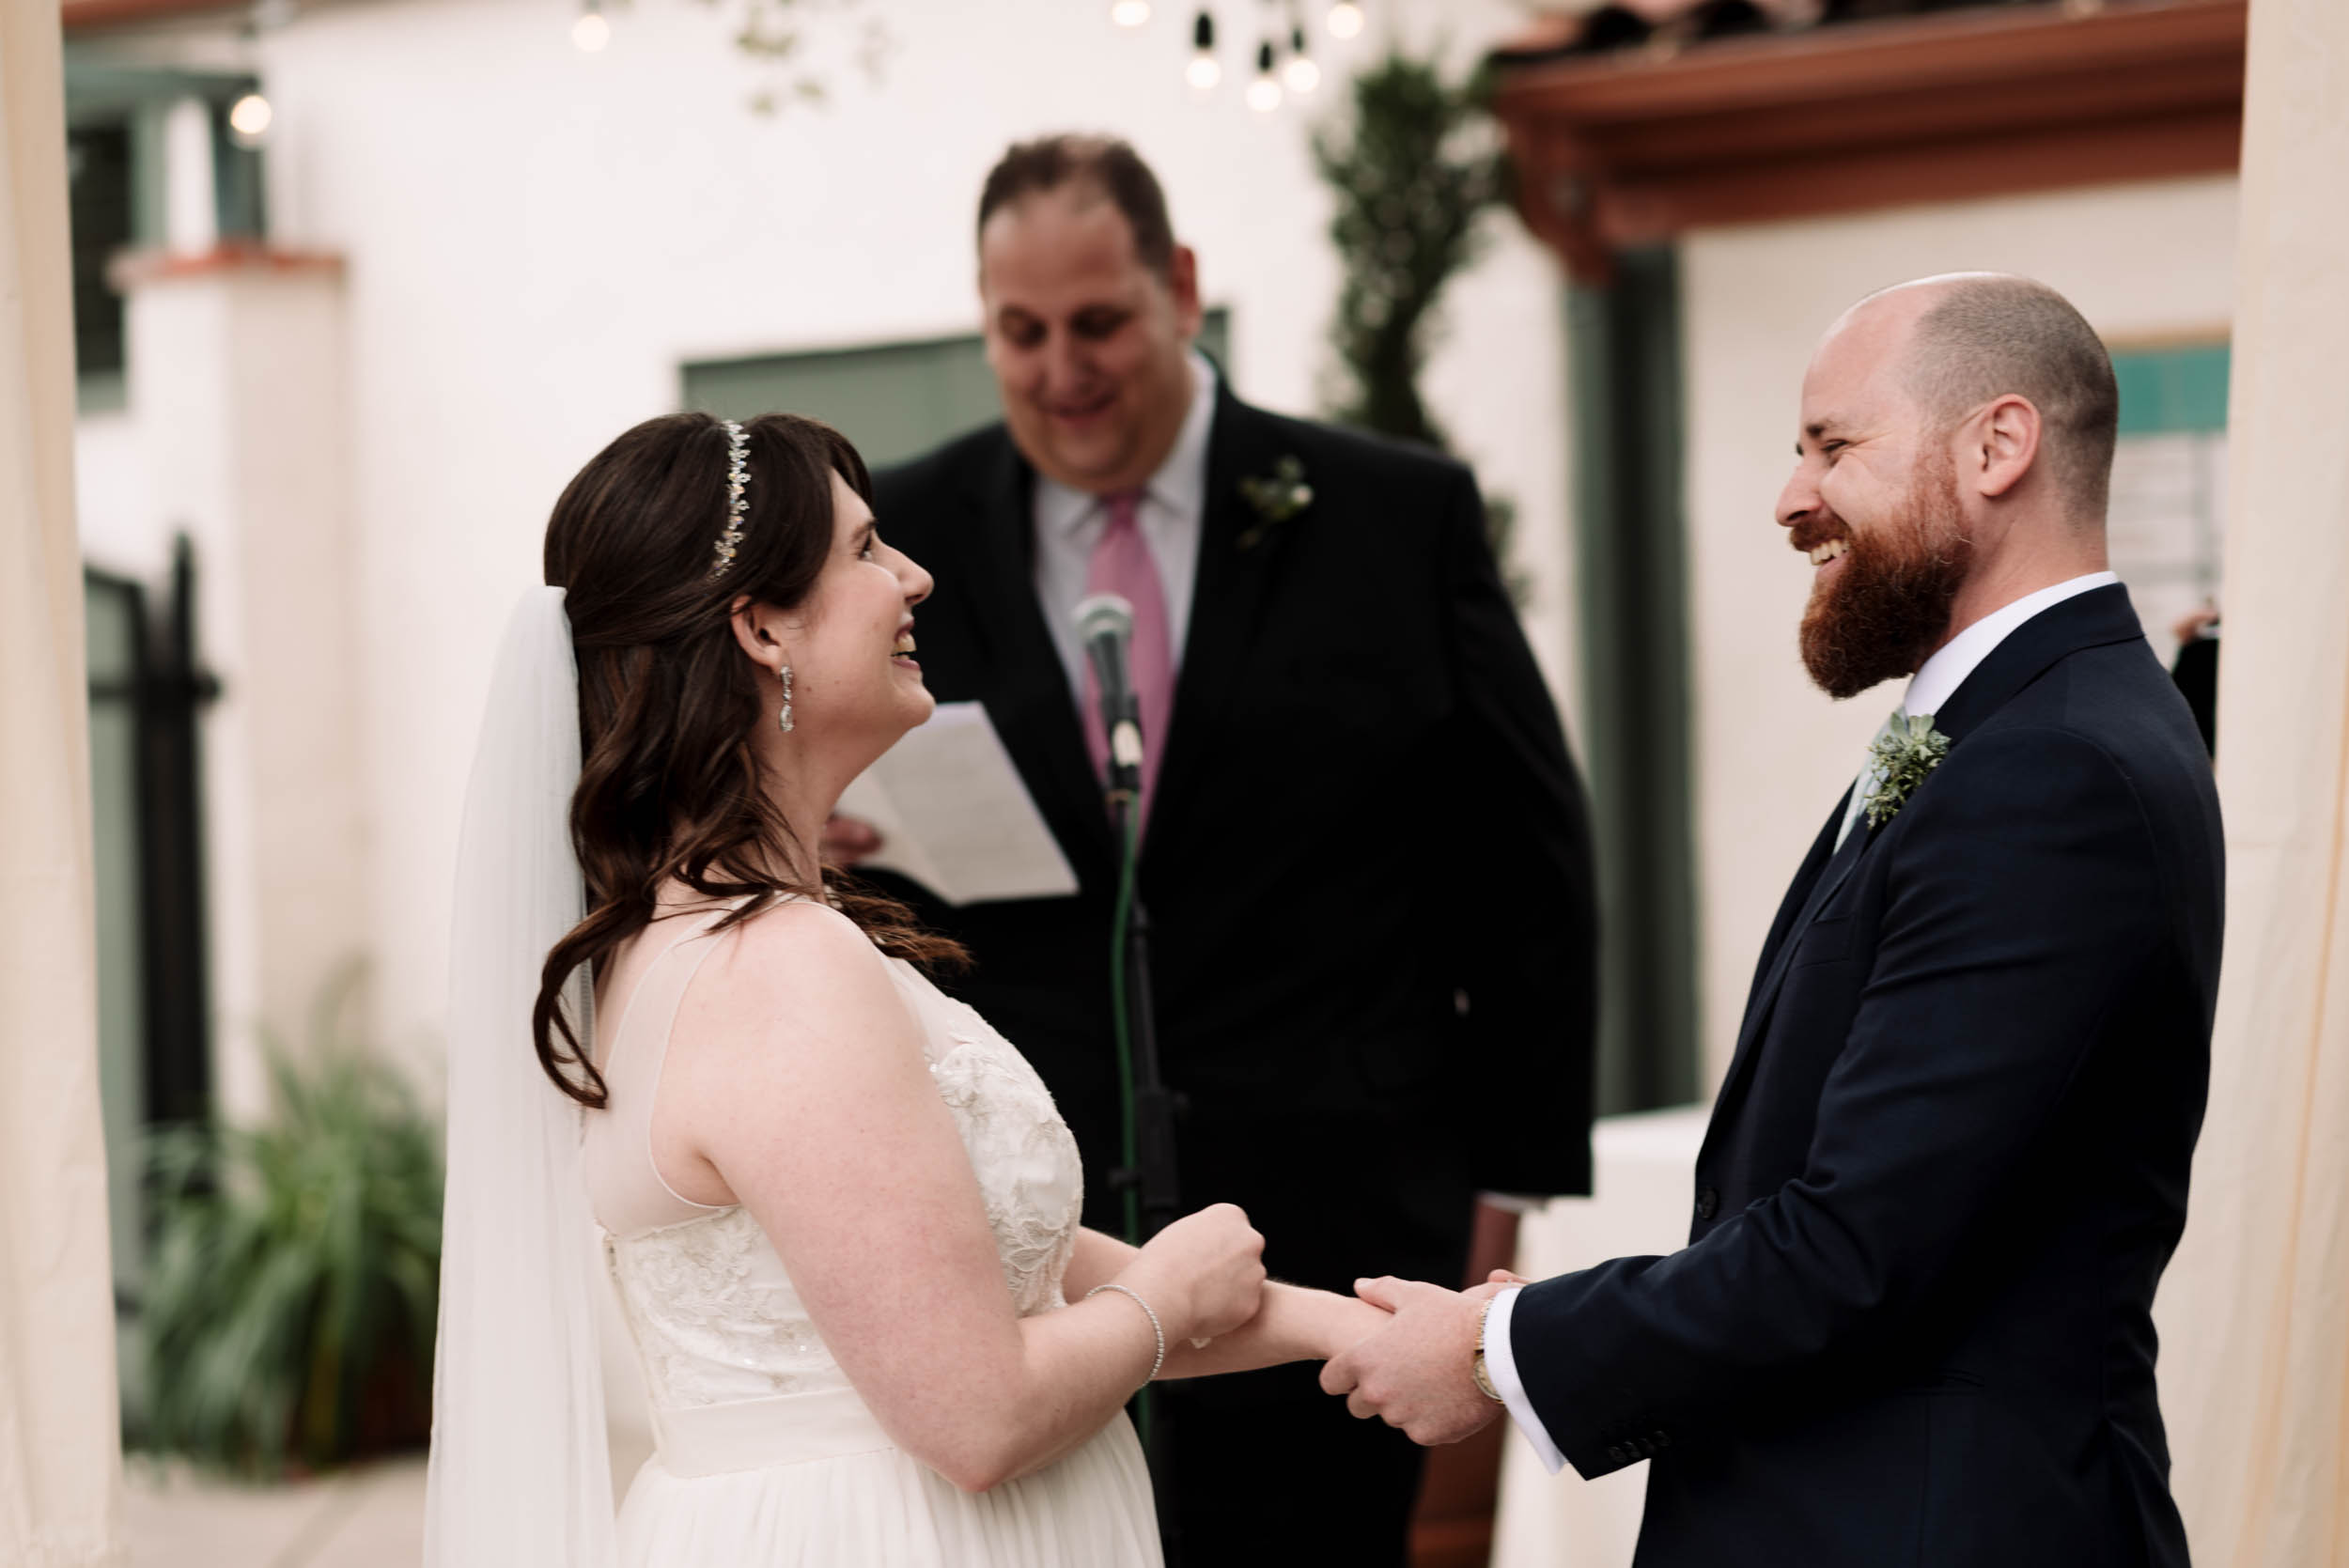 Desination_Wedding_Los Angeles-18.jpg